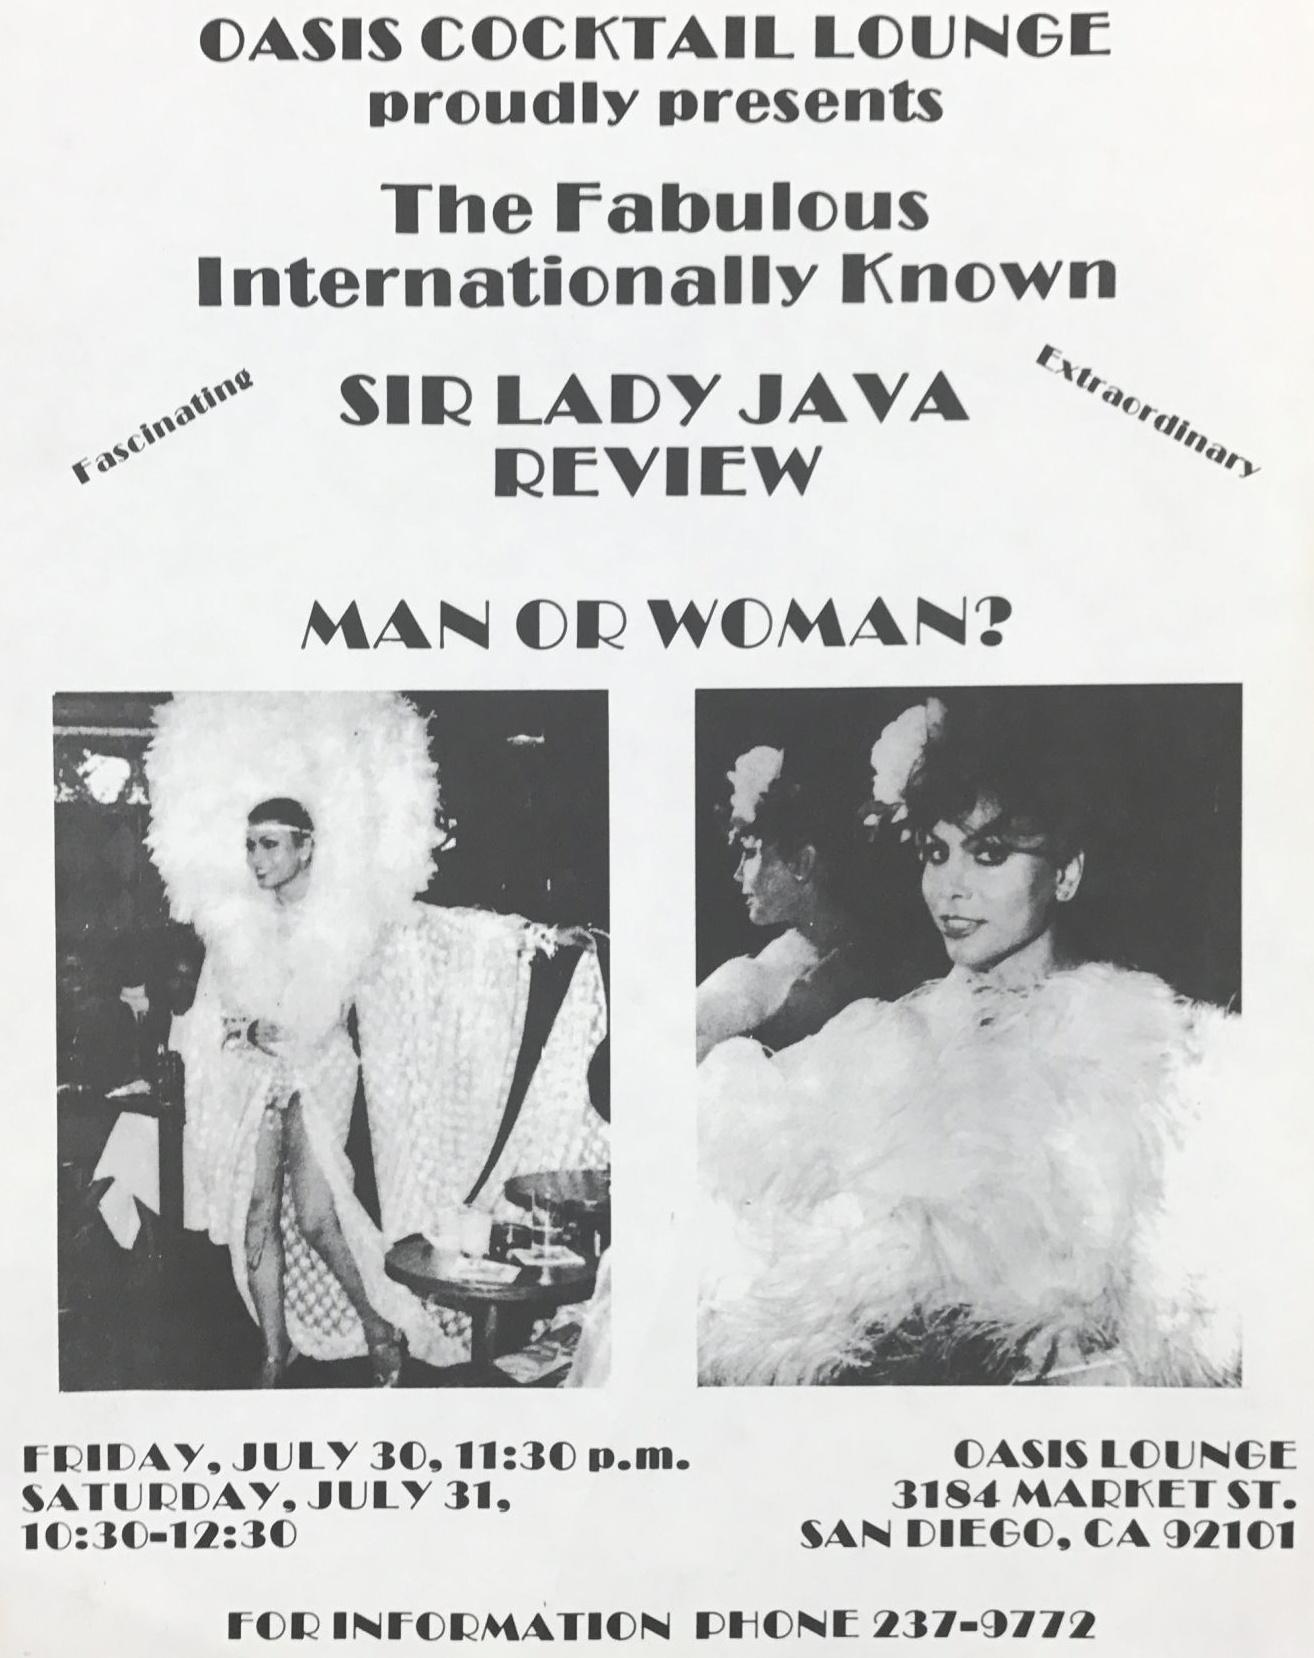 Sir Lady Java at San Diego Oasis Lounge, July 31, 1971